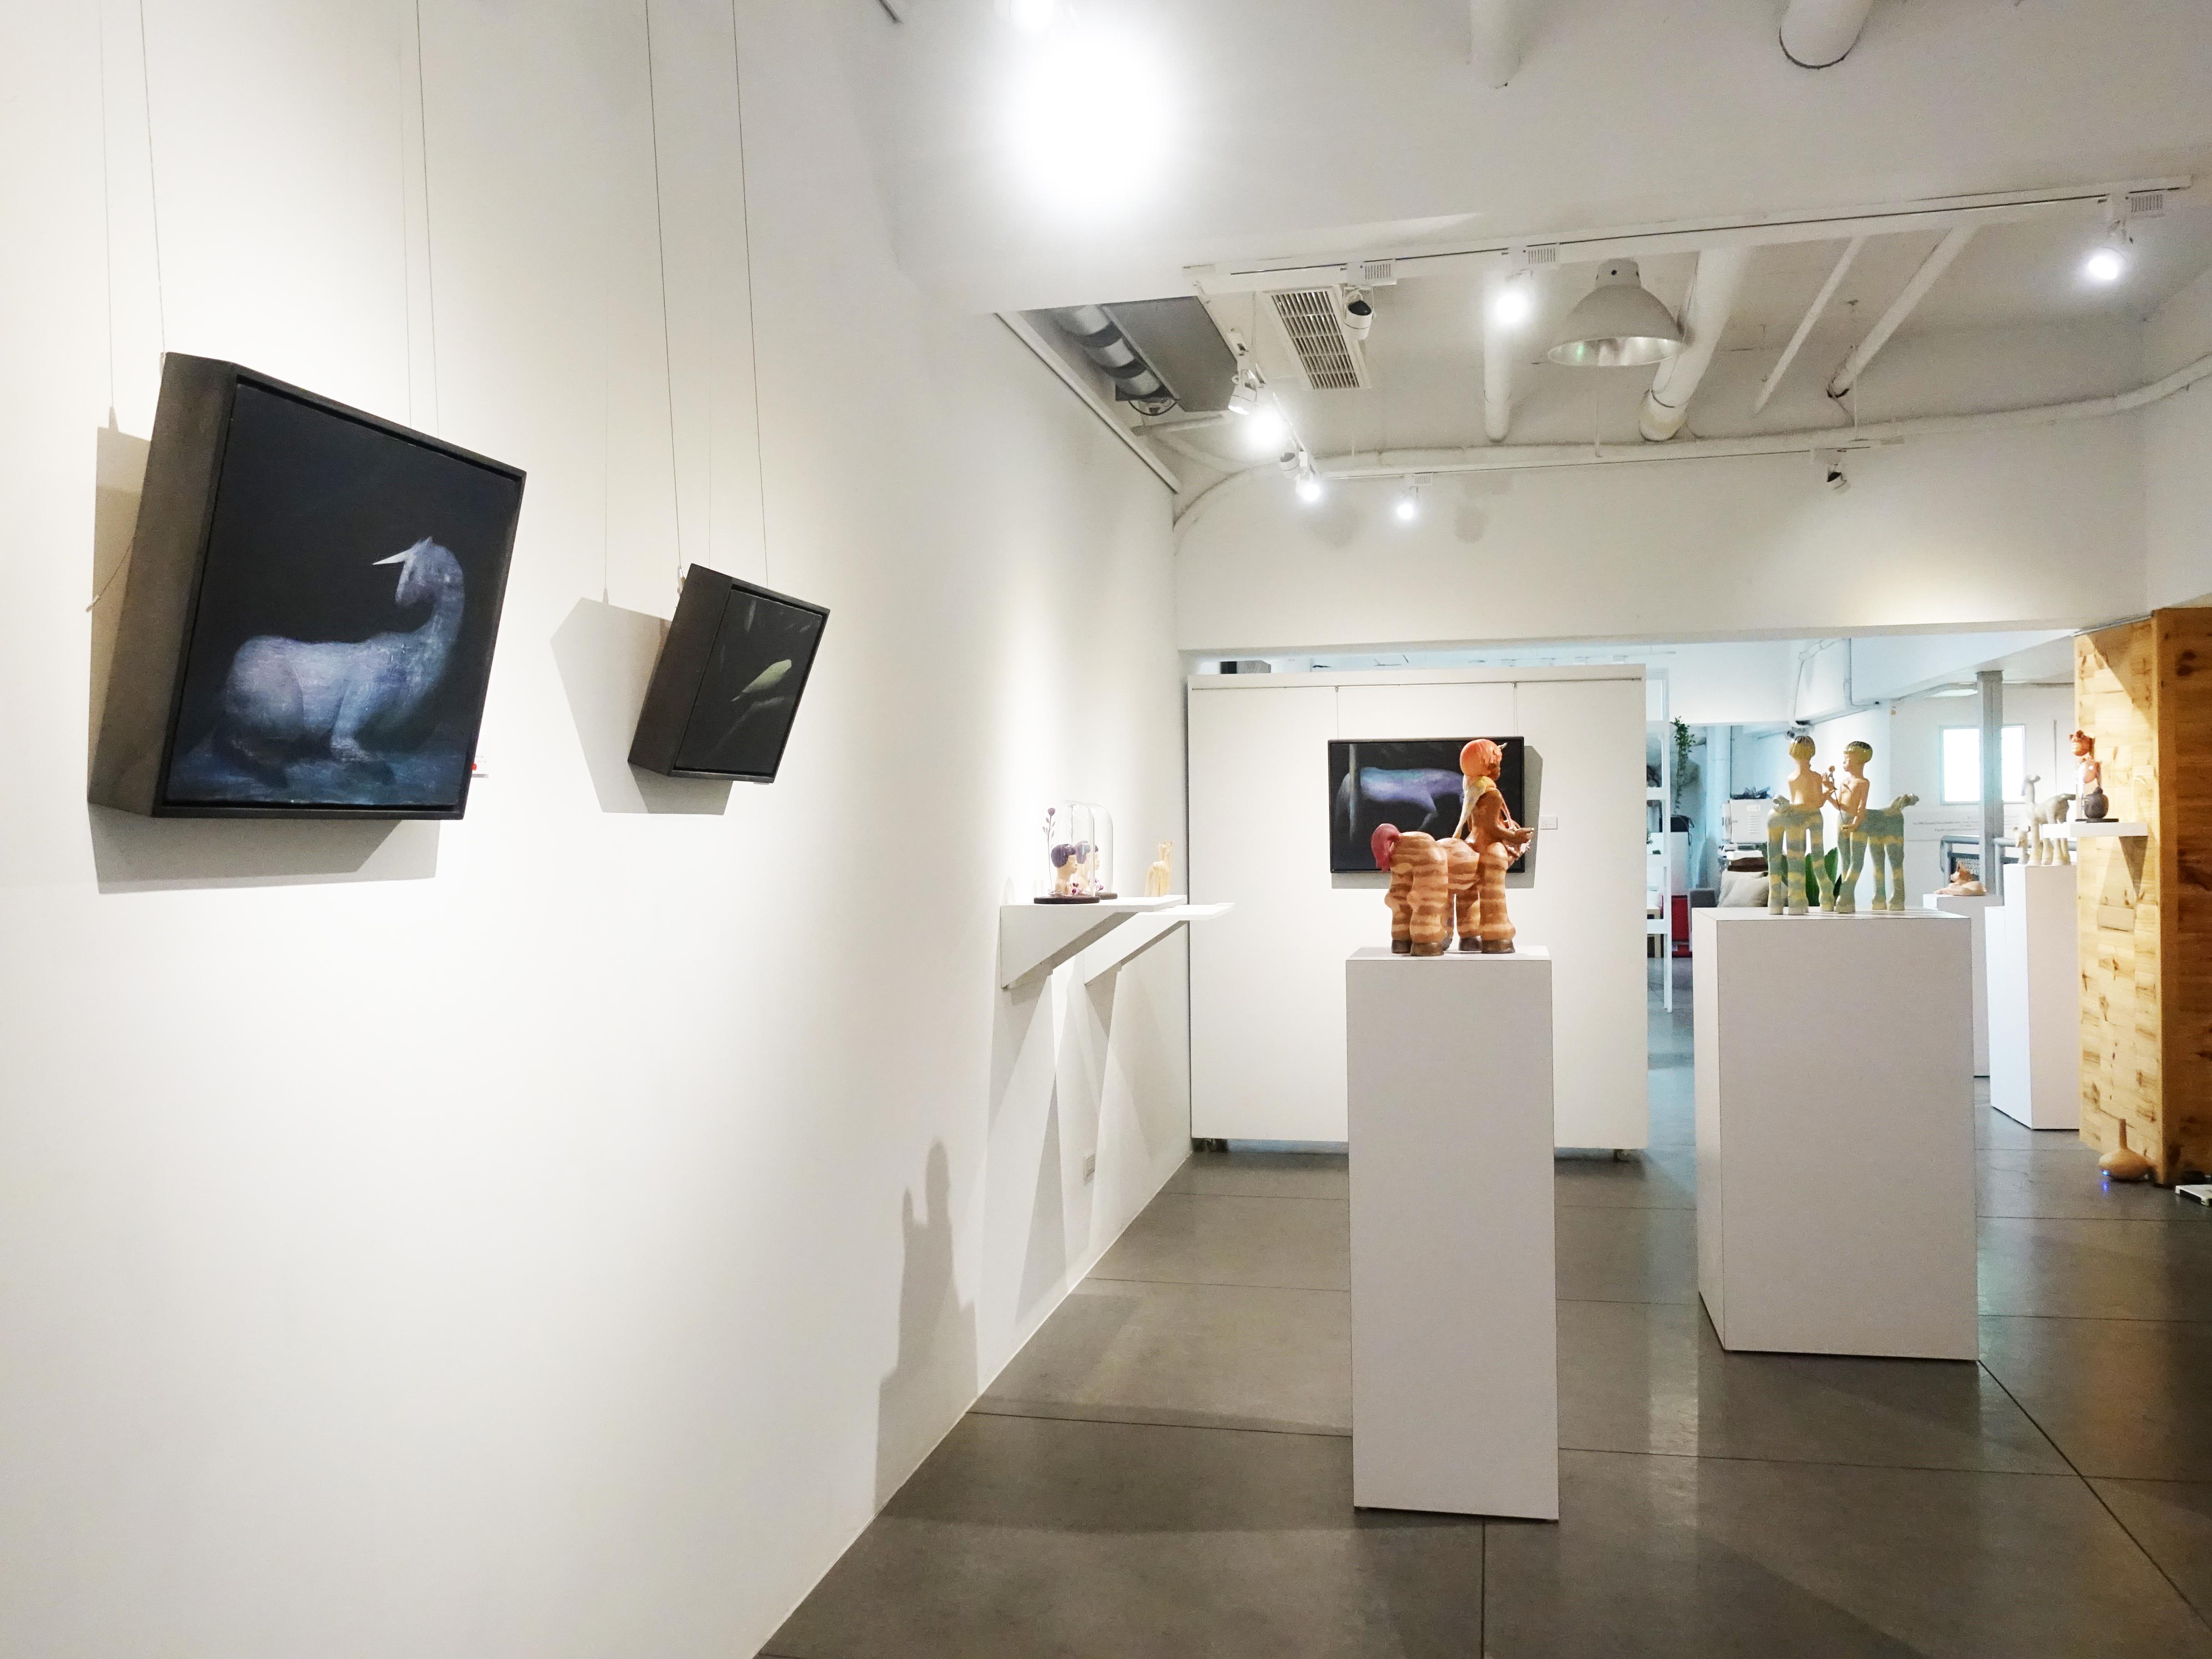 CC Gallery展出藝術家楊宗嘉與鄭思宇雙人展「雙生神話 」。